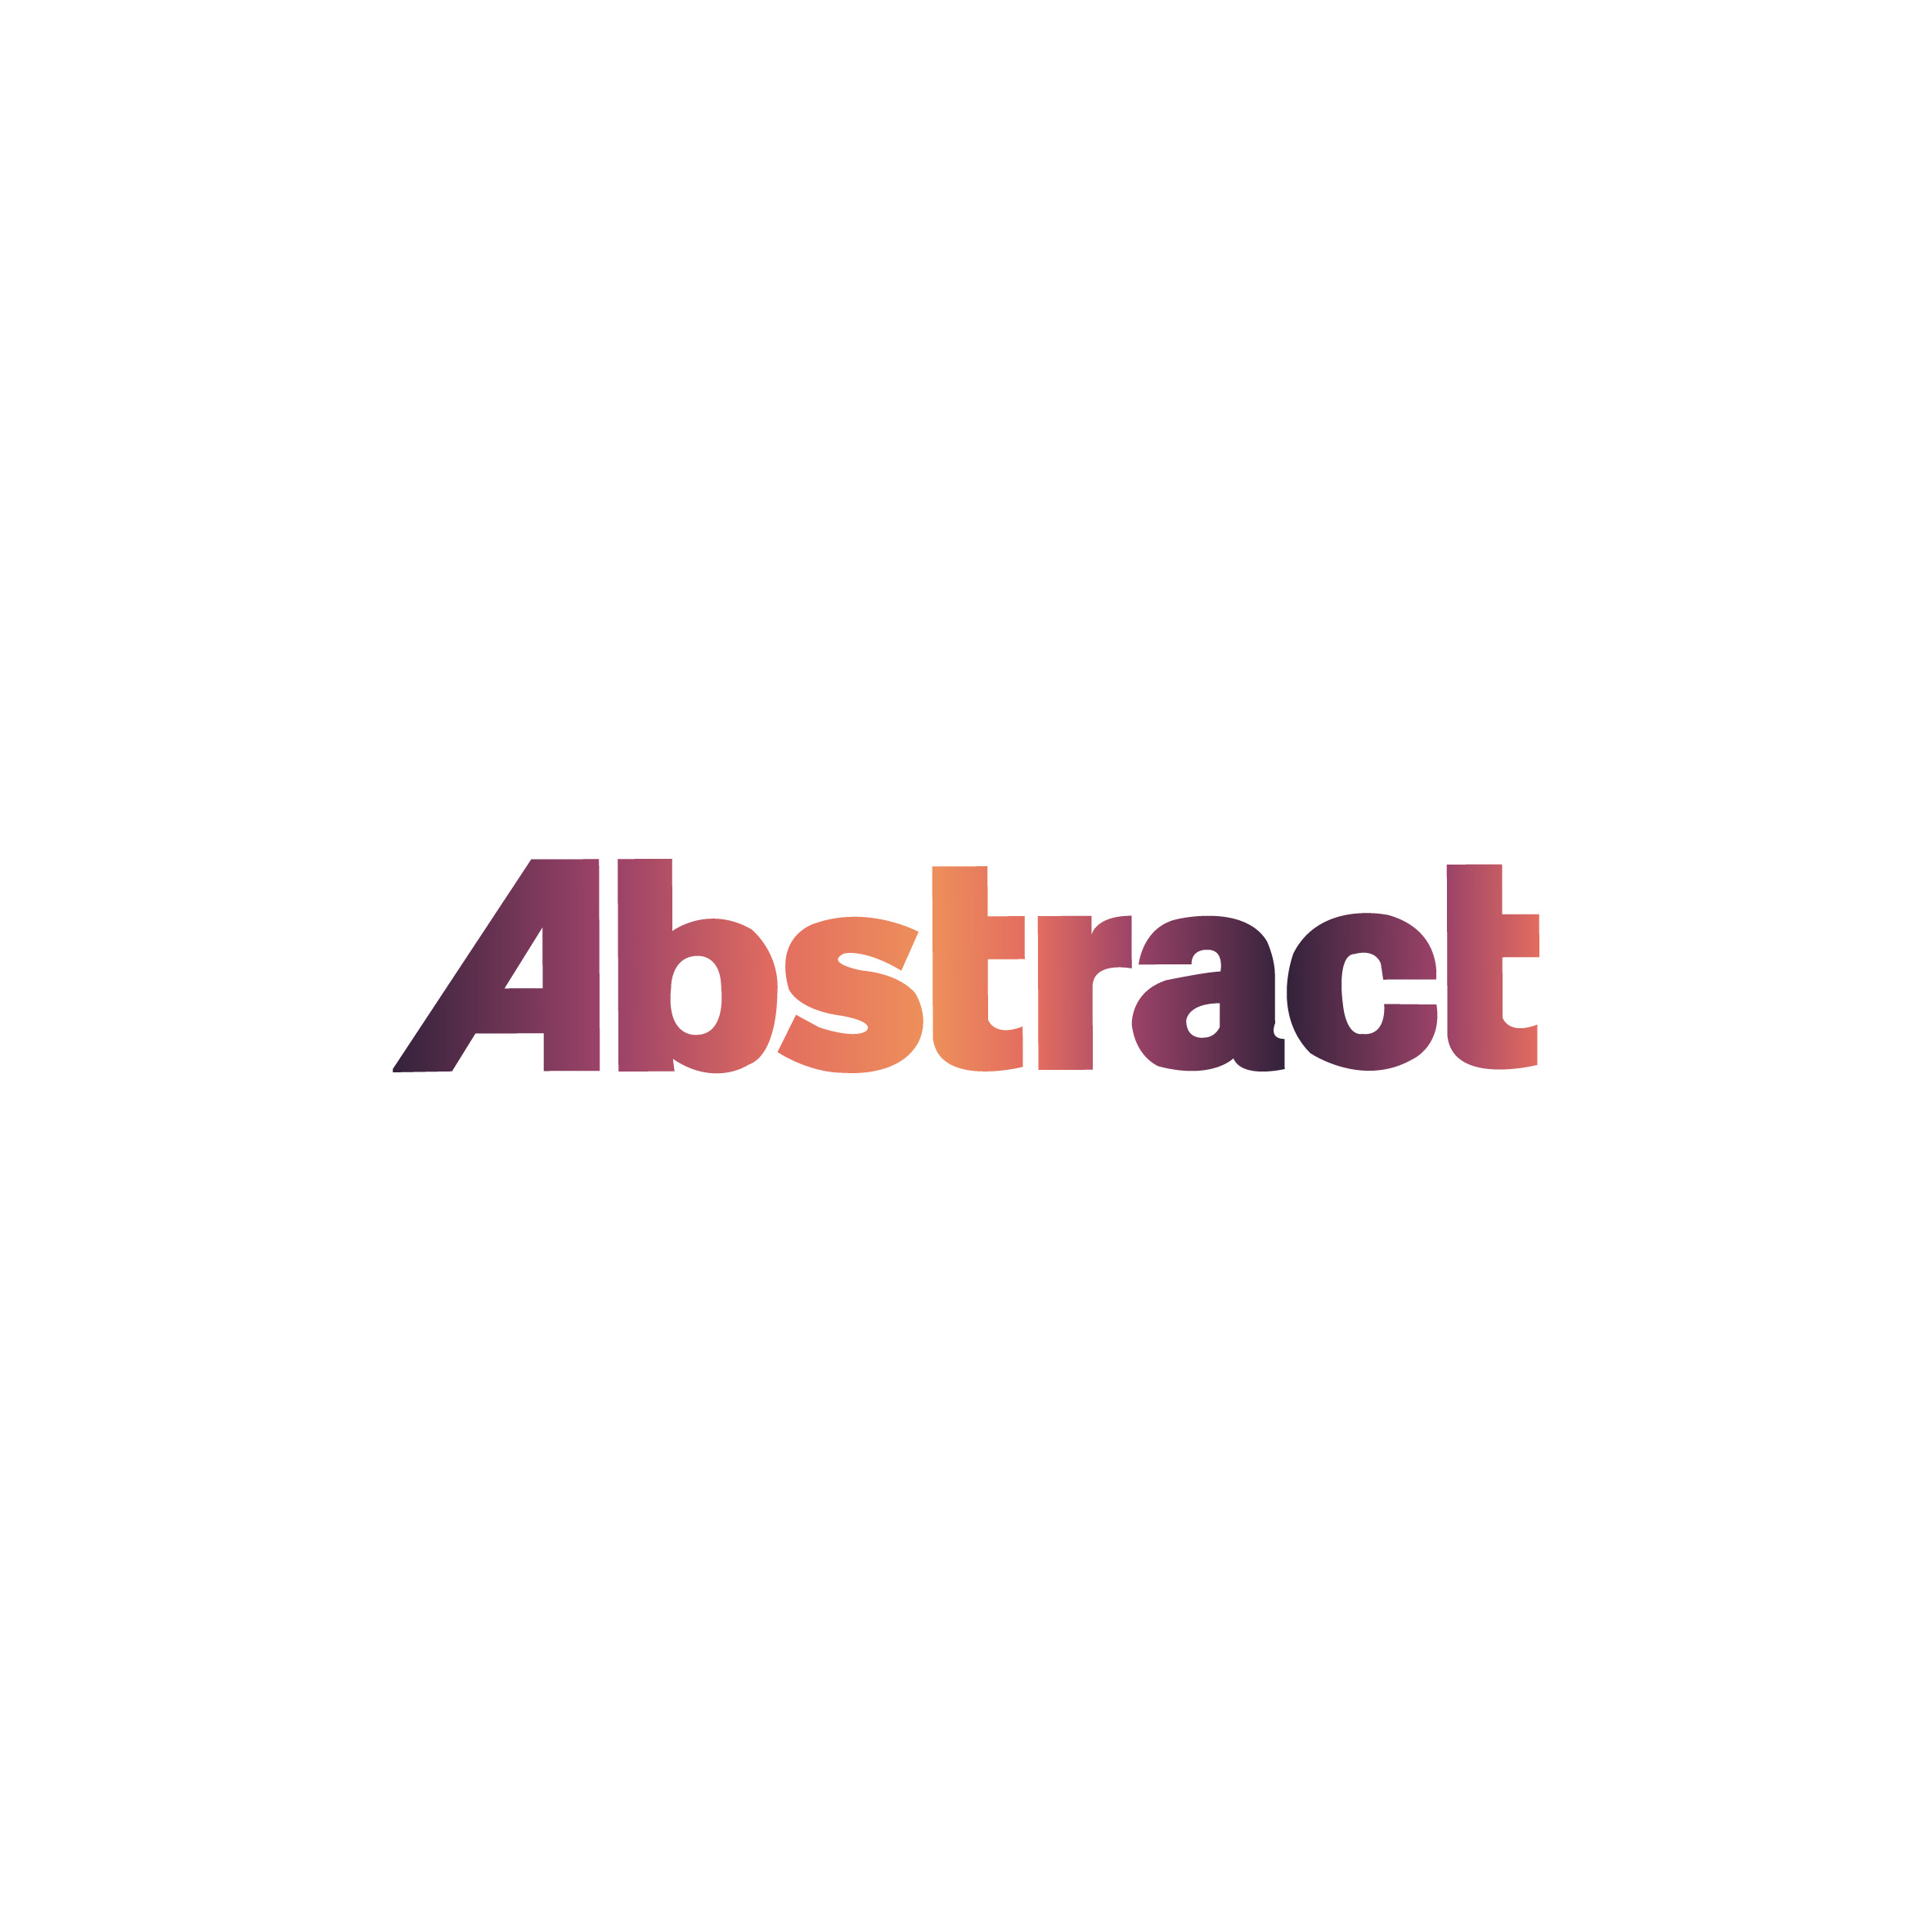 Abstract+.jpg